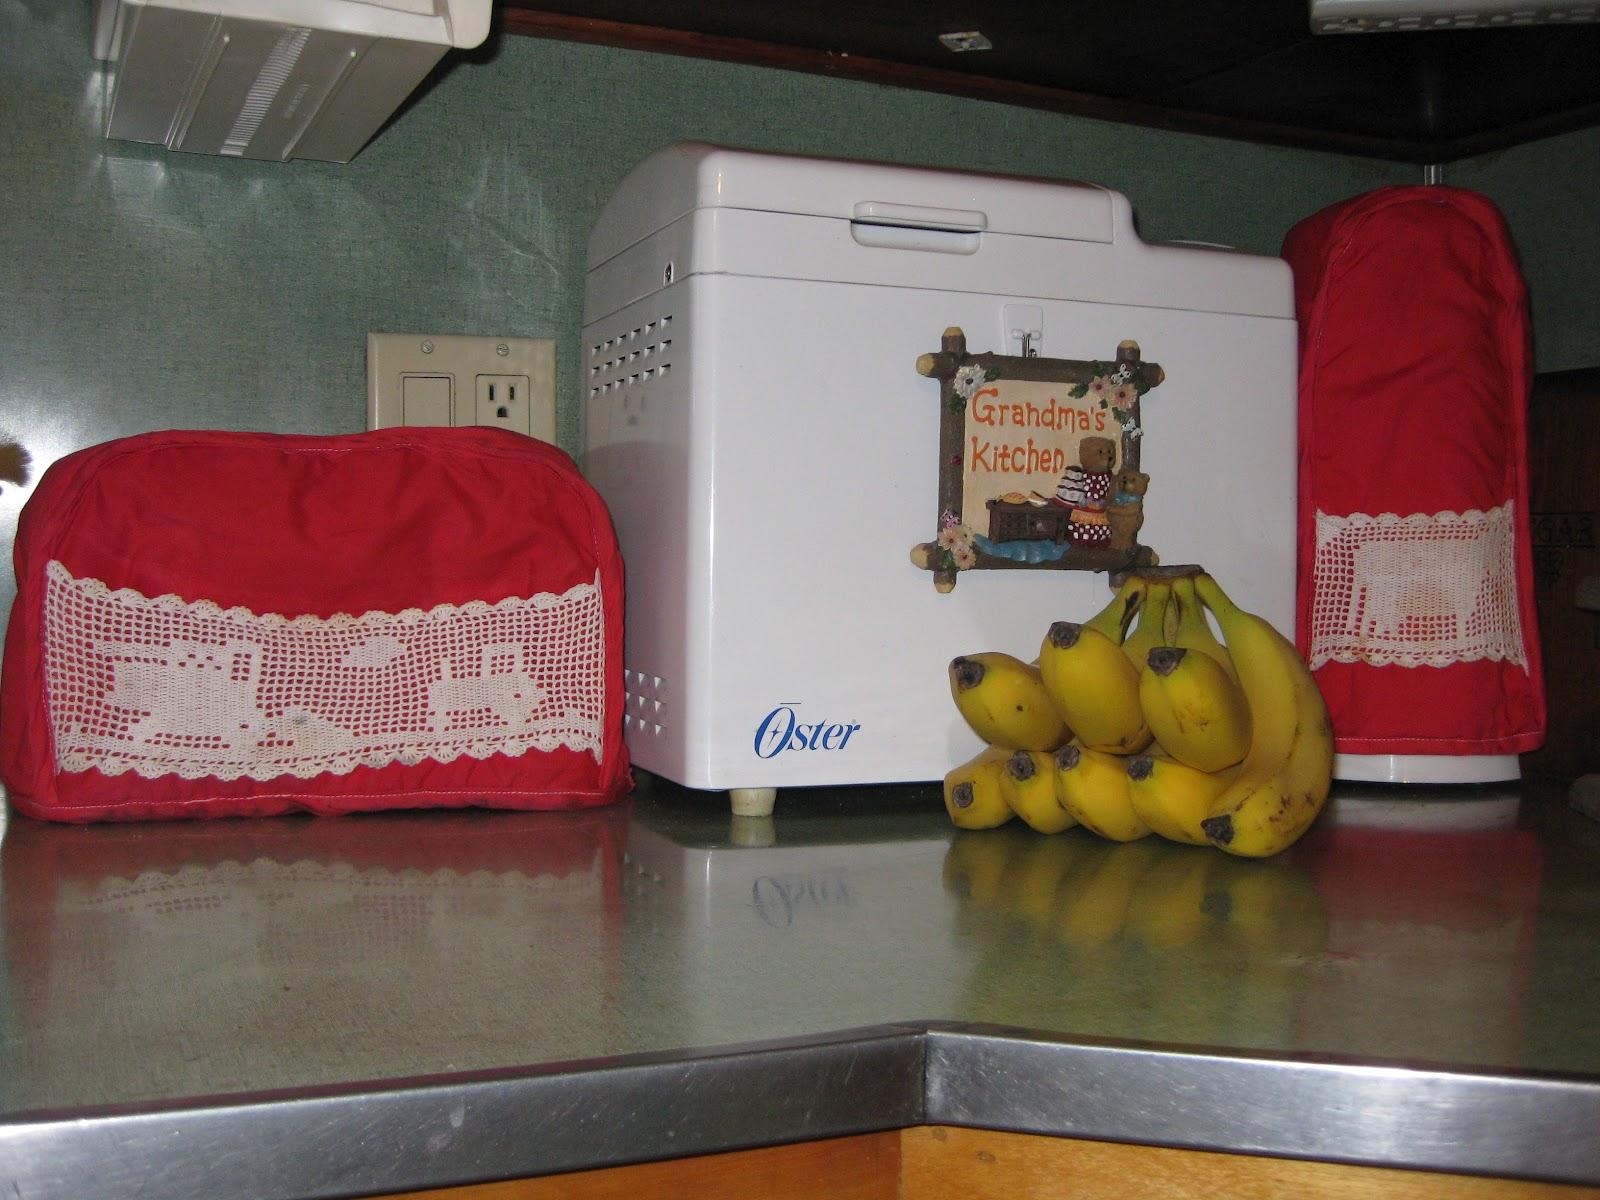 Cloth Covers Kitchen Appliances